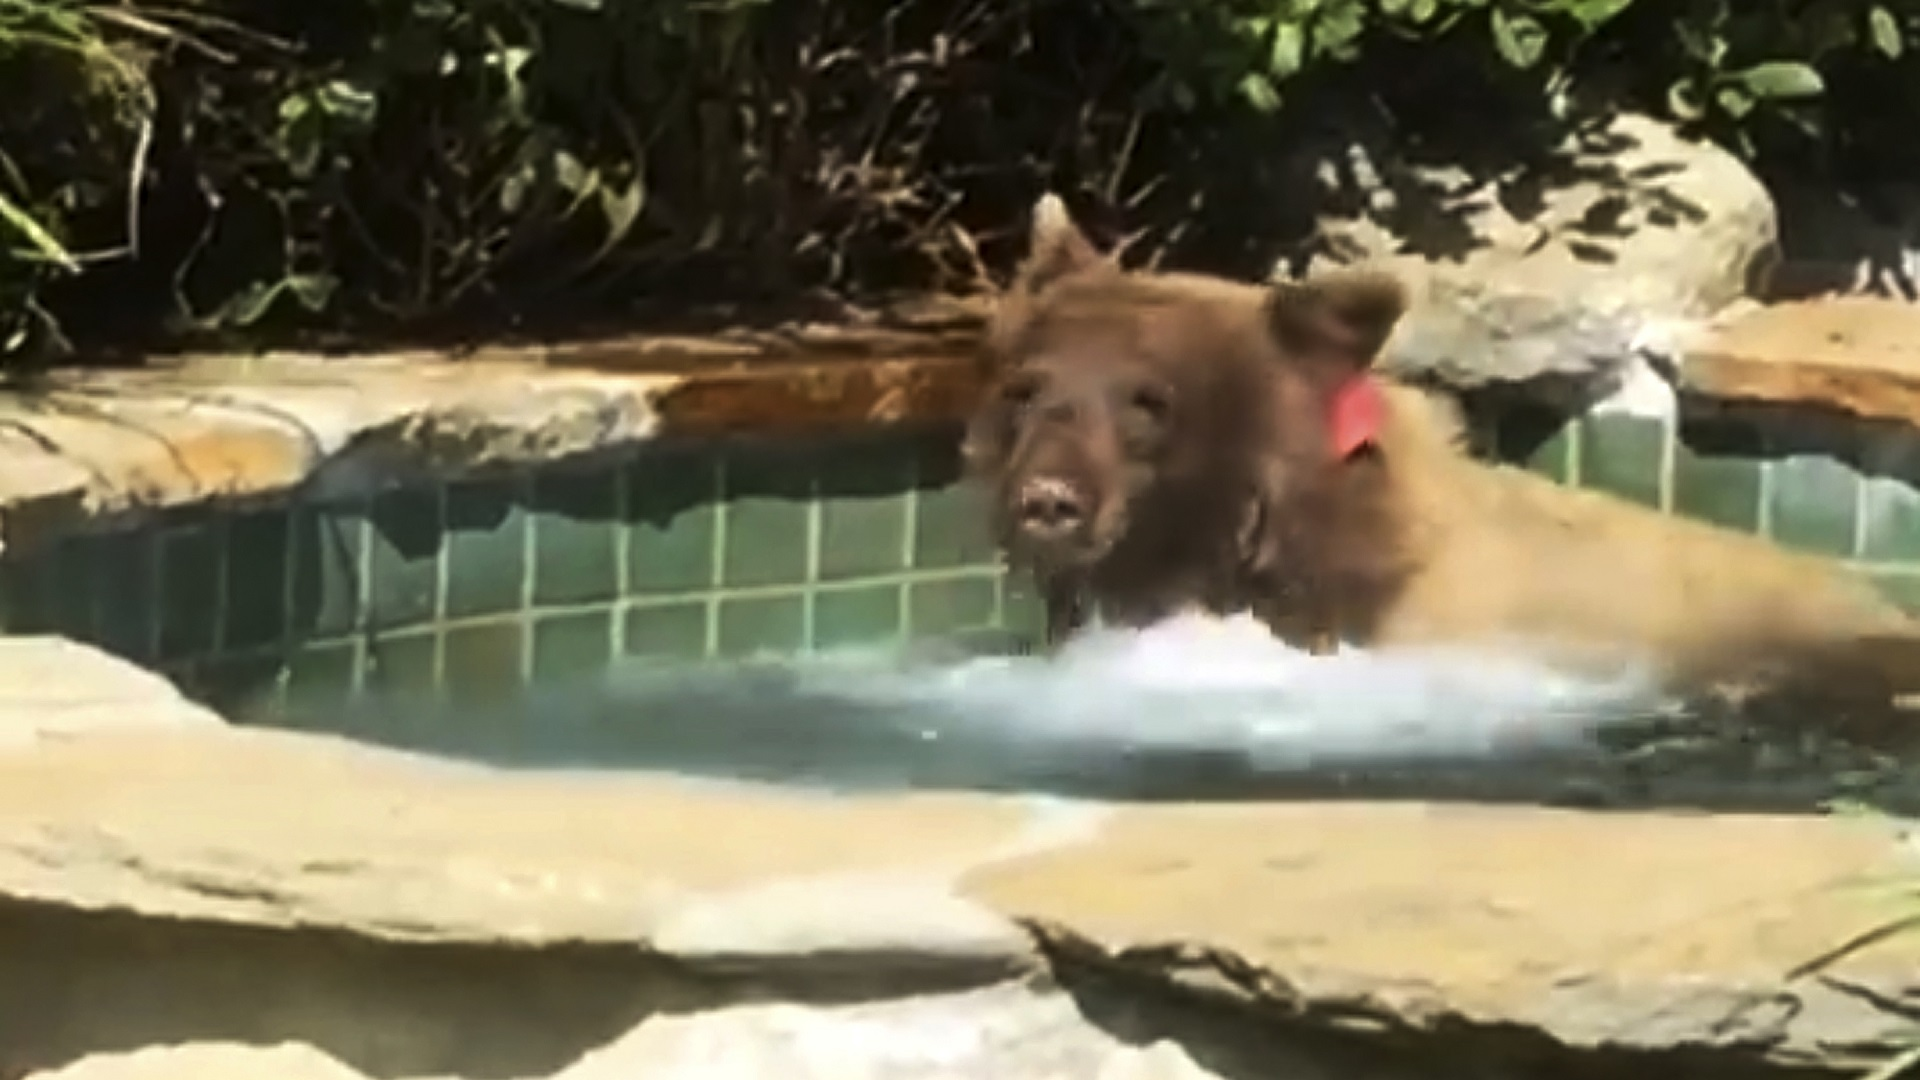 Bear In Hot Tub_1530659556077-846652698